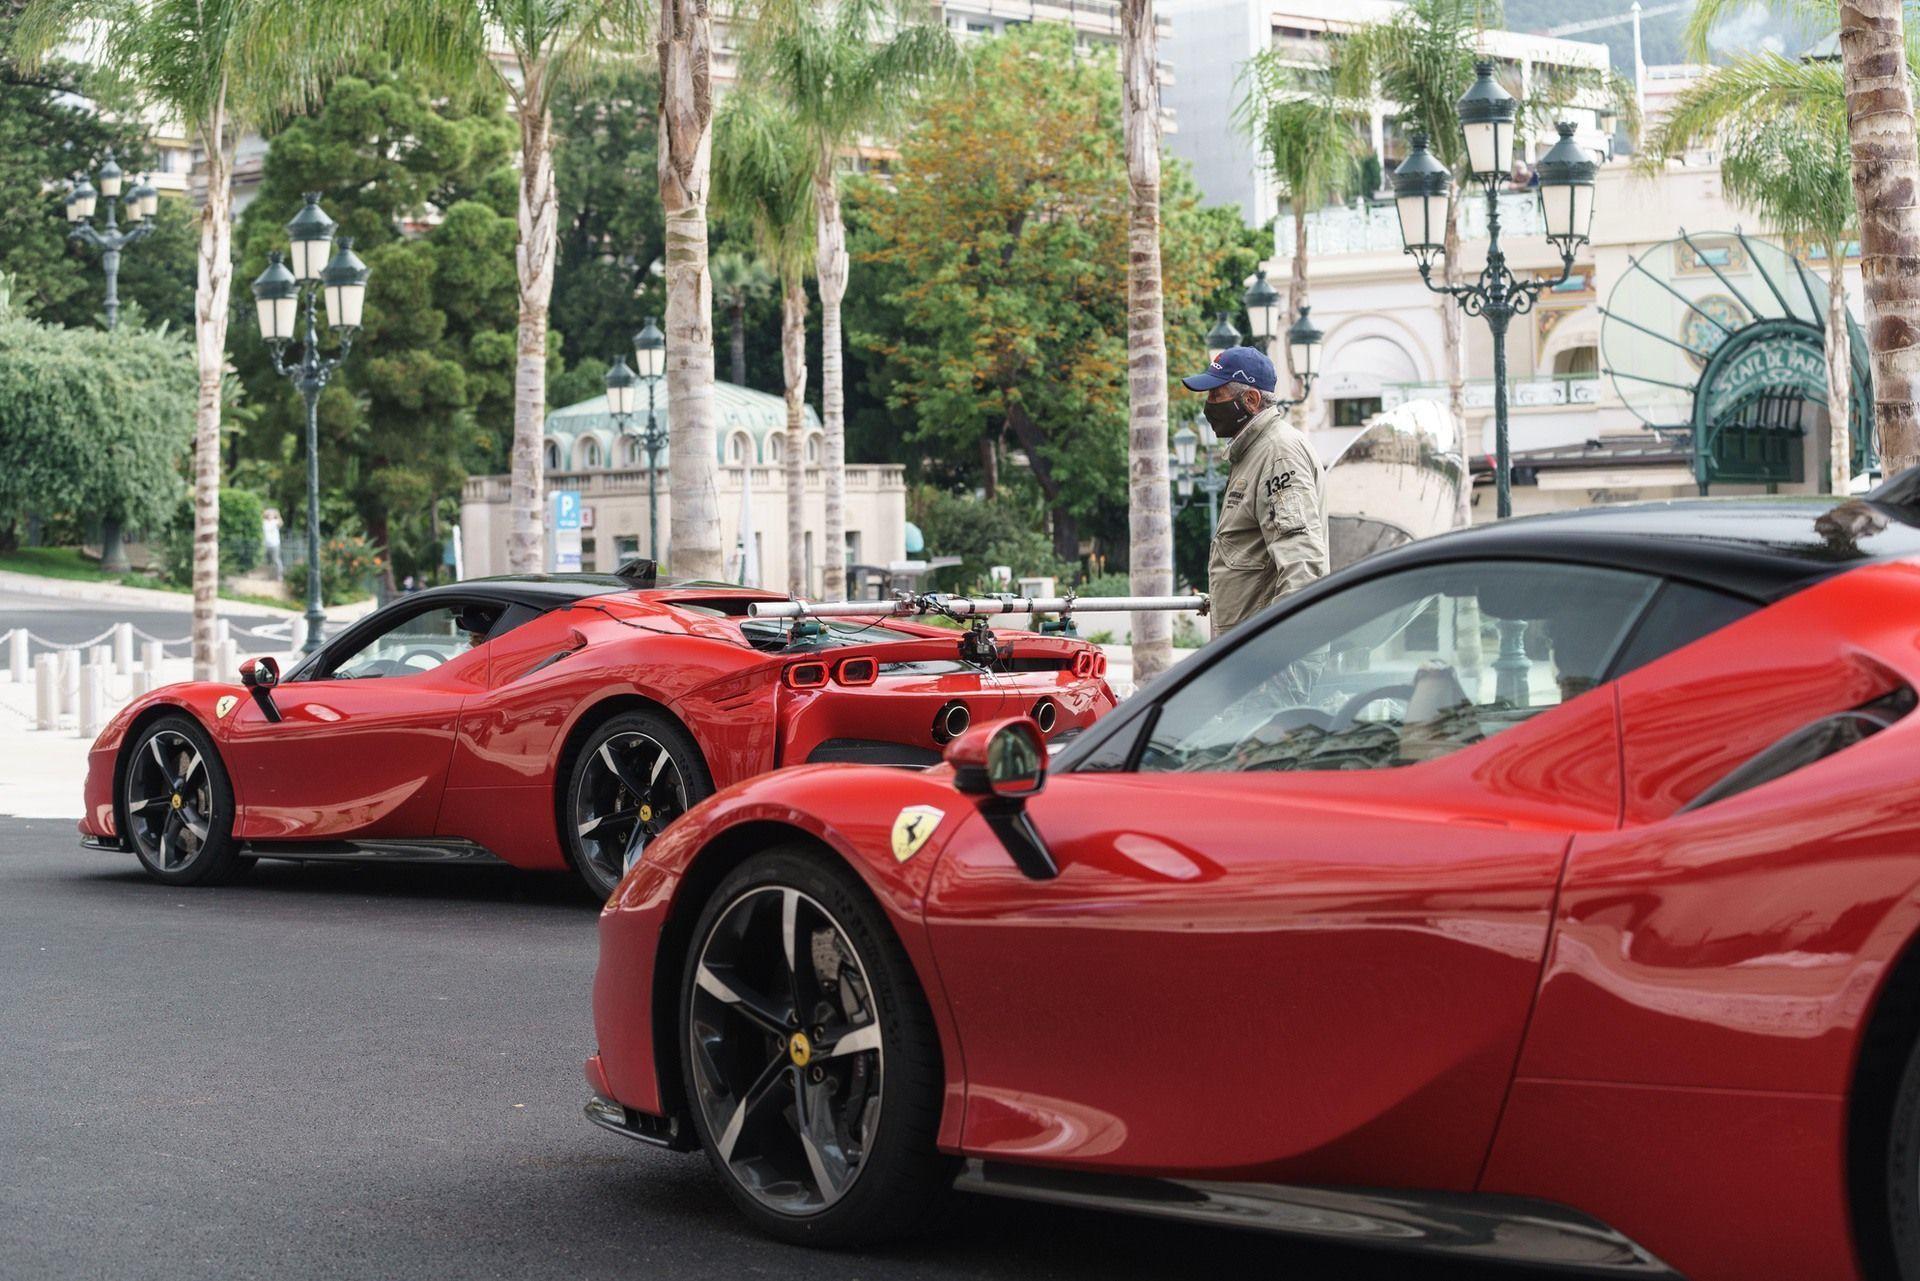 Ferrari_SF90_Stradale_Claude_Charles_Leclerc_Monaco_2020_0000